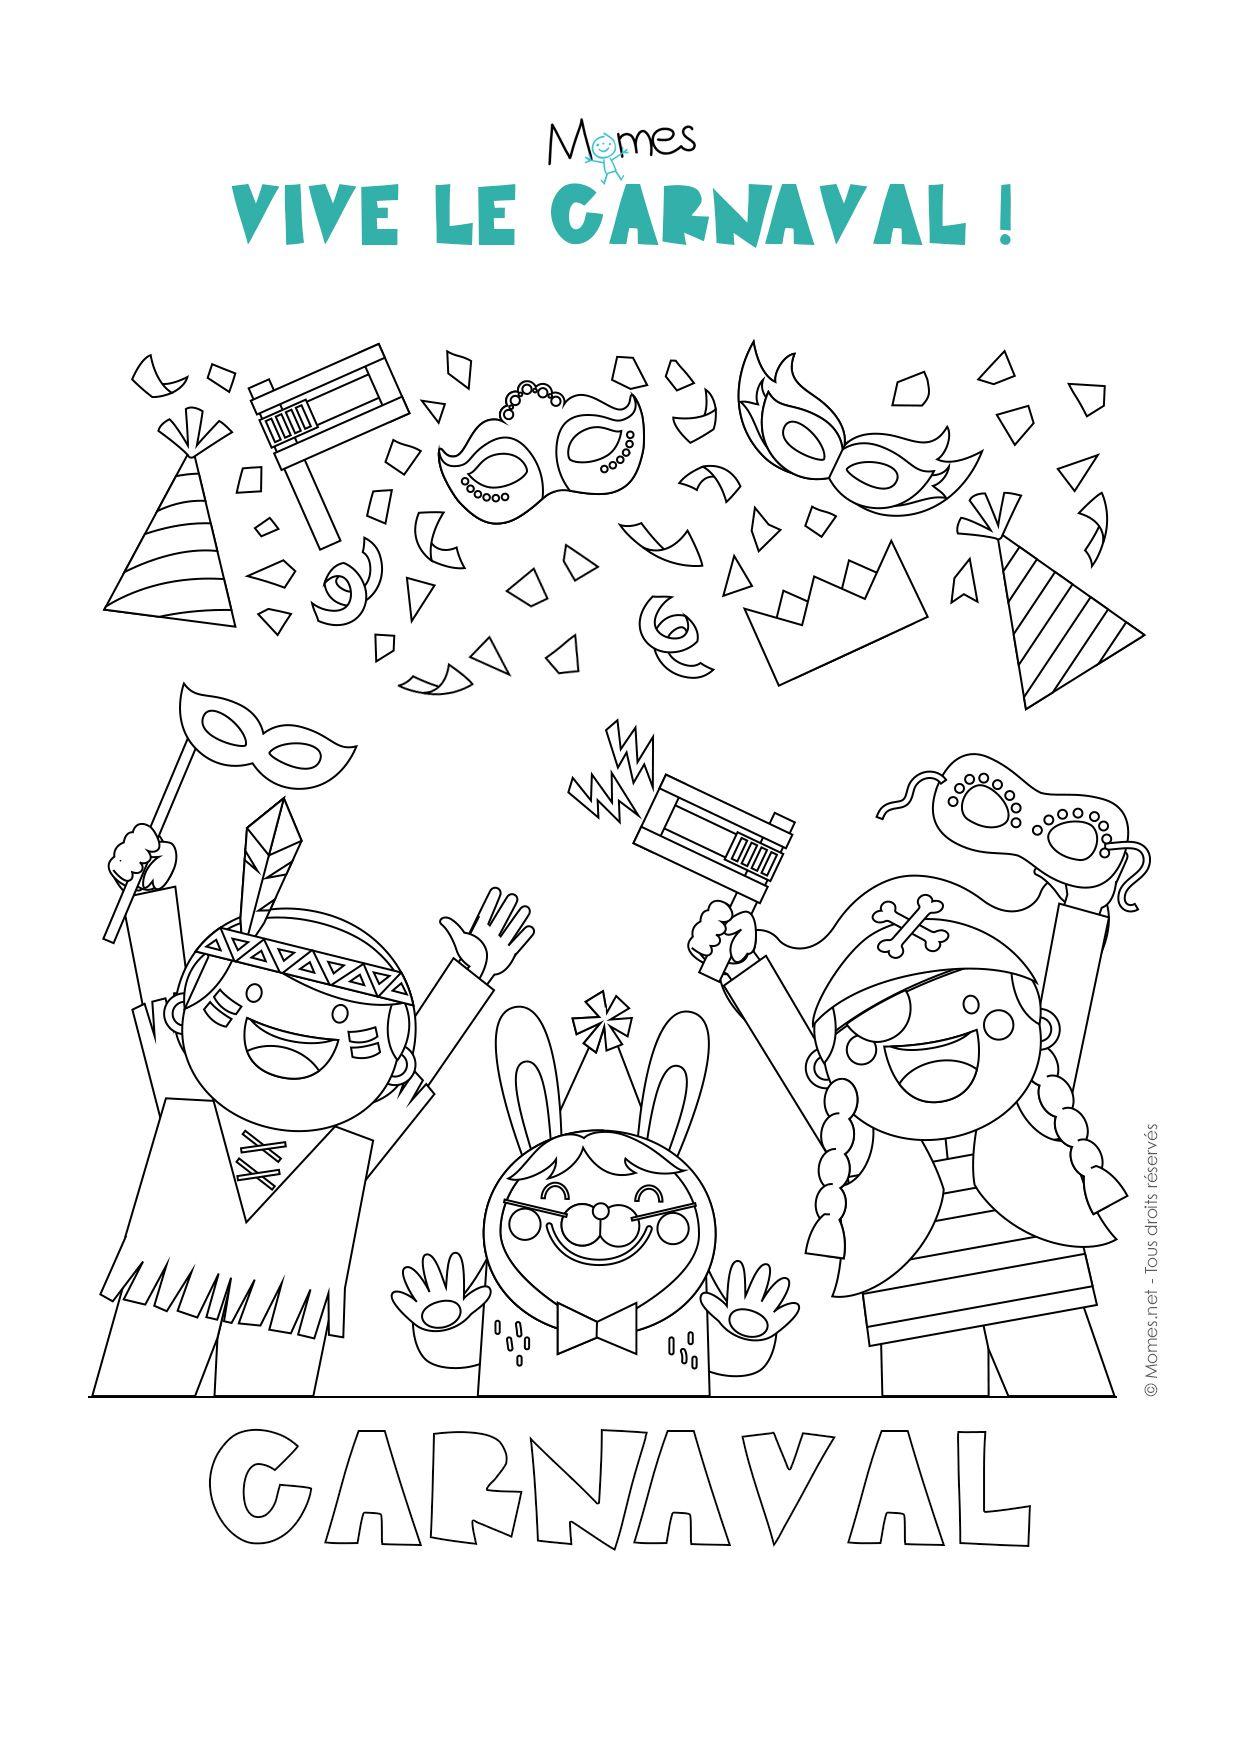 Coloriage Carnaval | Coloriage Carnaval, Carnaval Et Dessin serapportantà Coloriage De Carnaval A Imprimer Gratuit